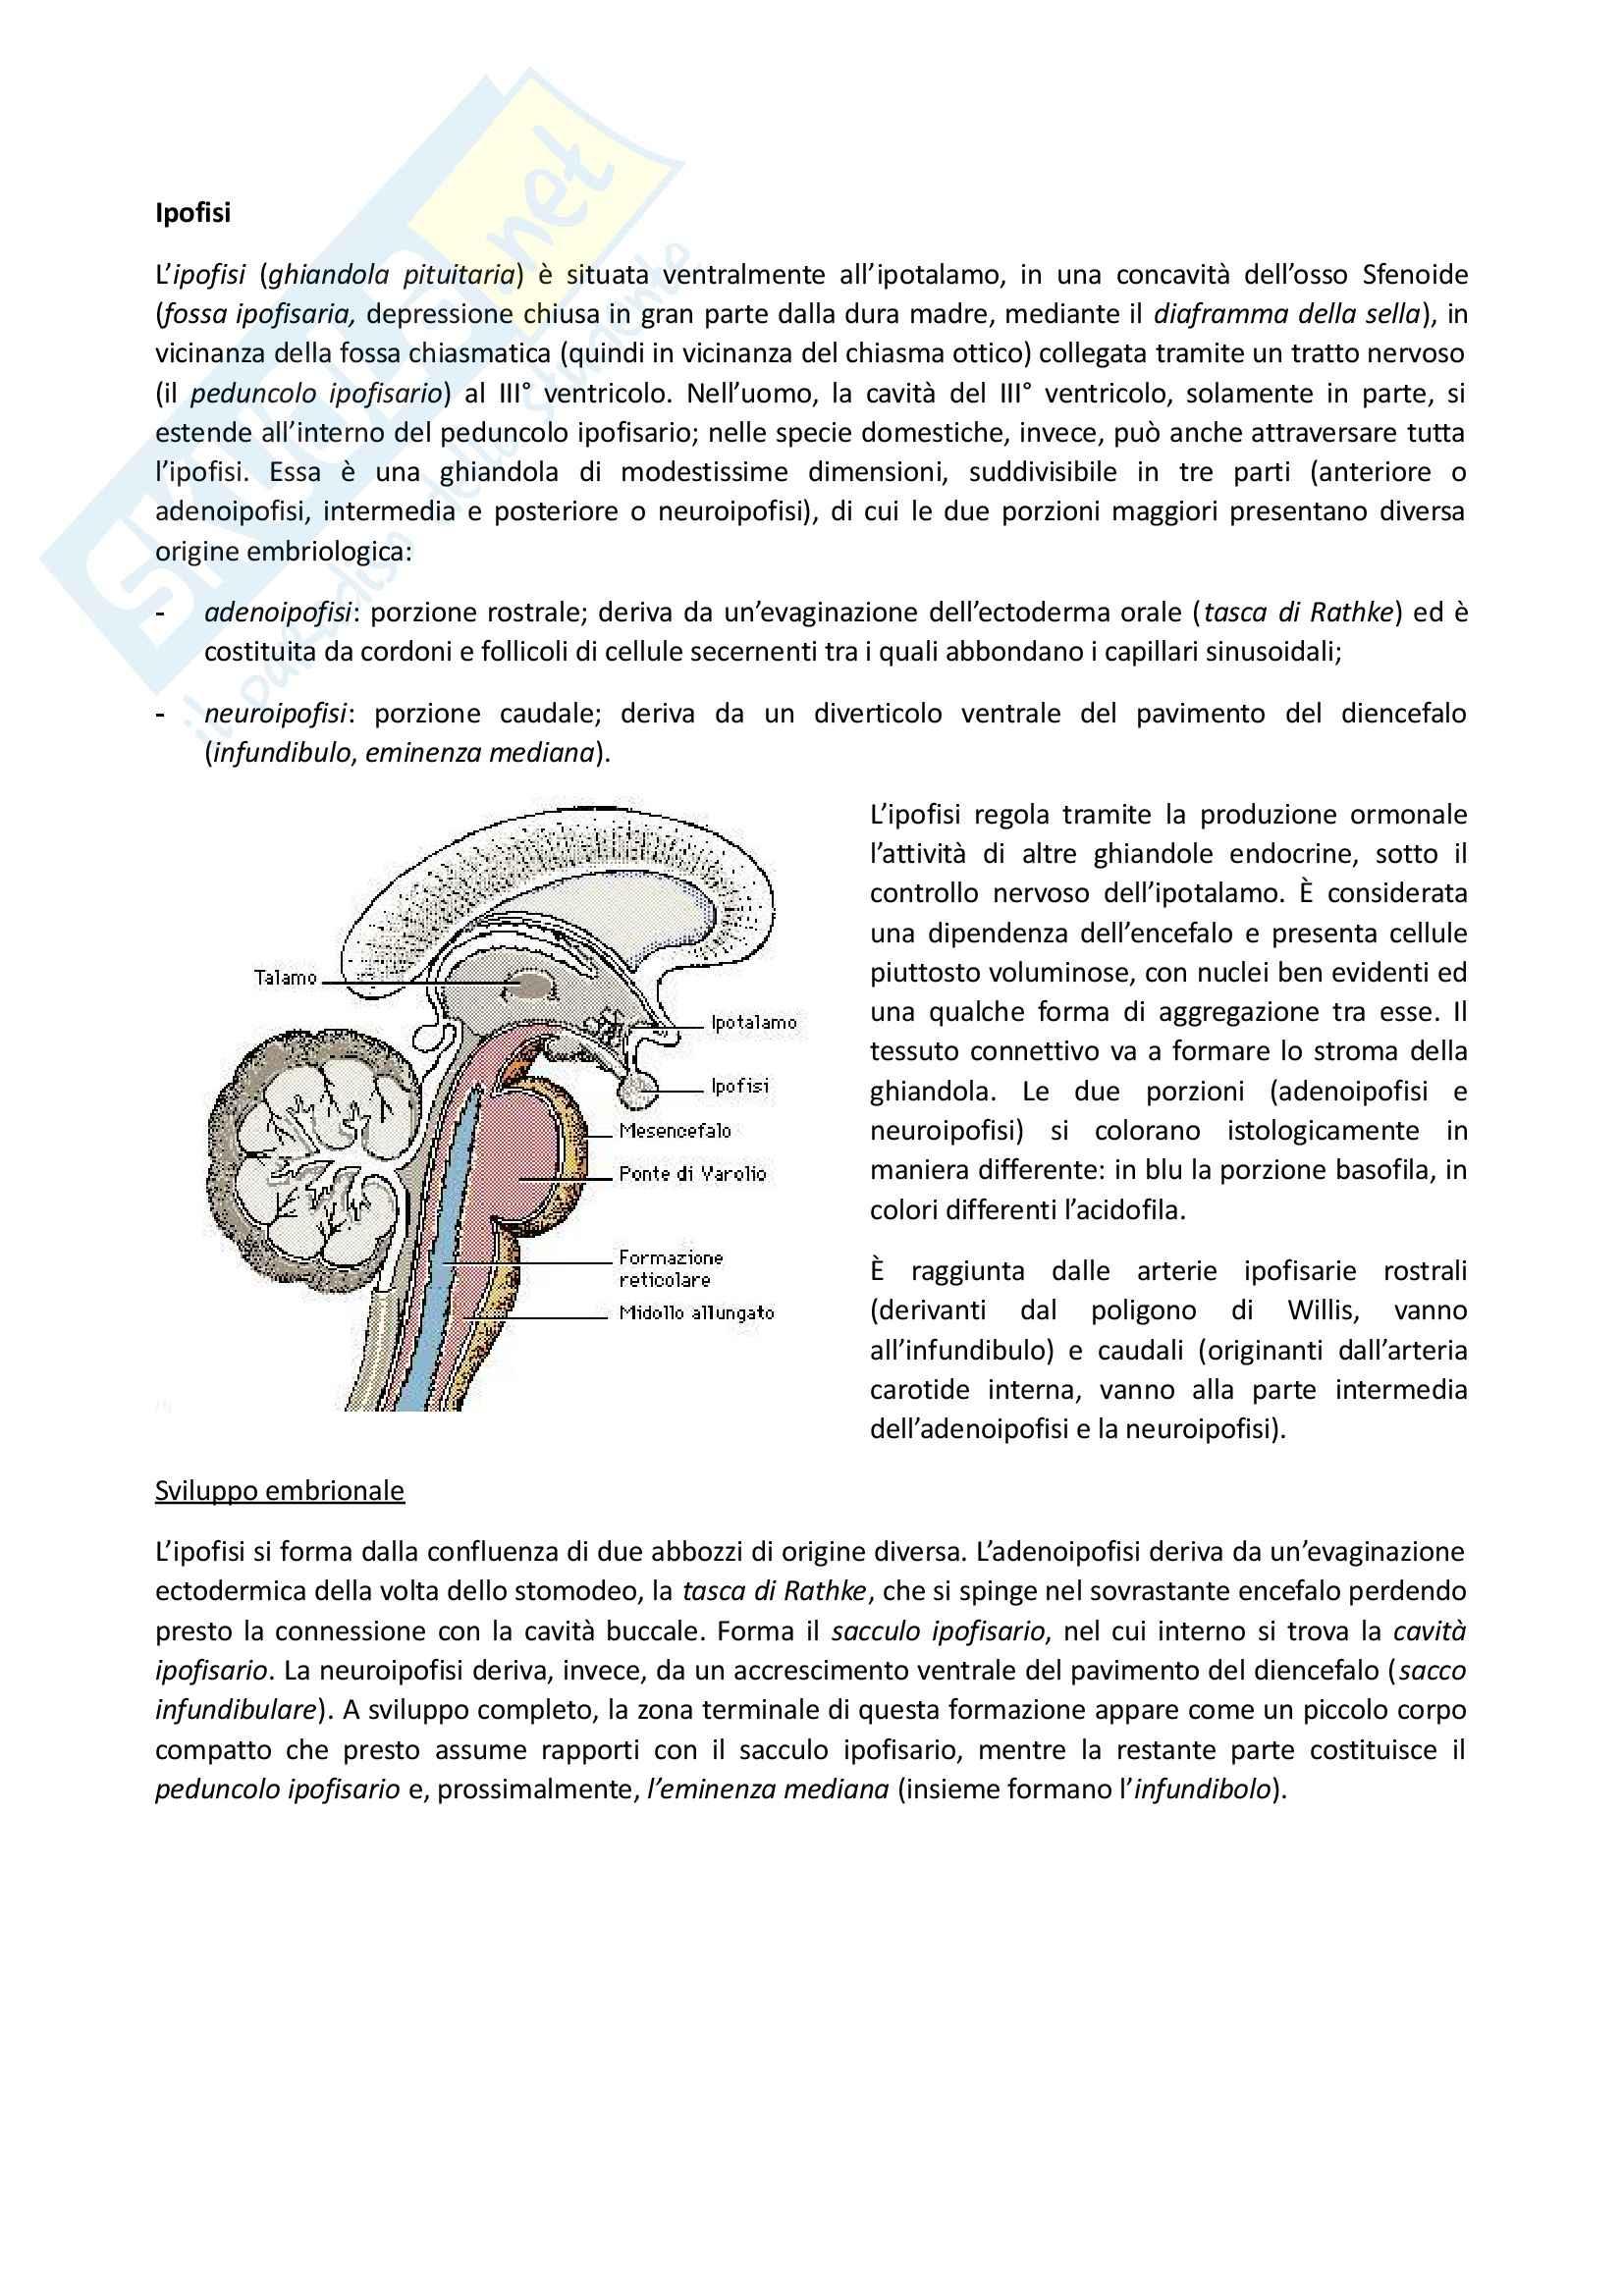 Sistema Endocrino, Anatomia comparata Pag. 2